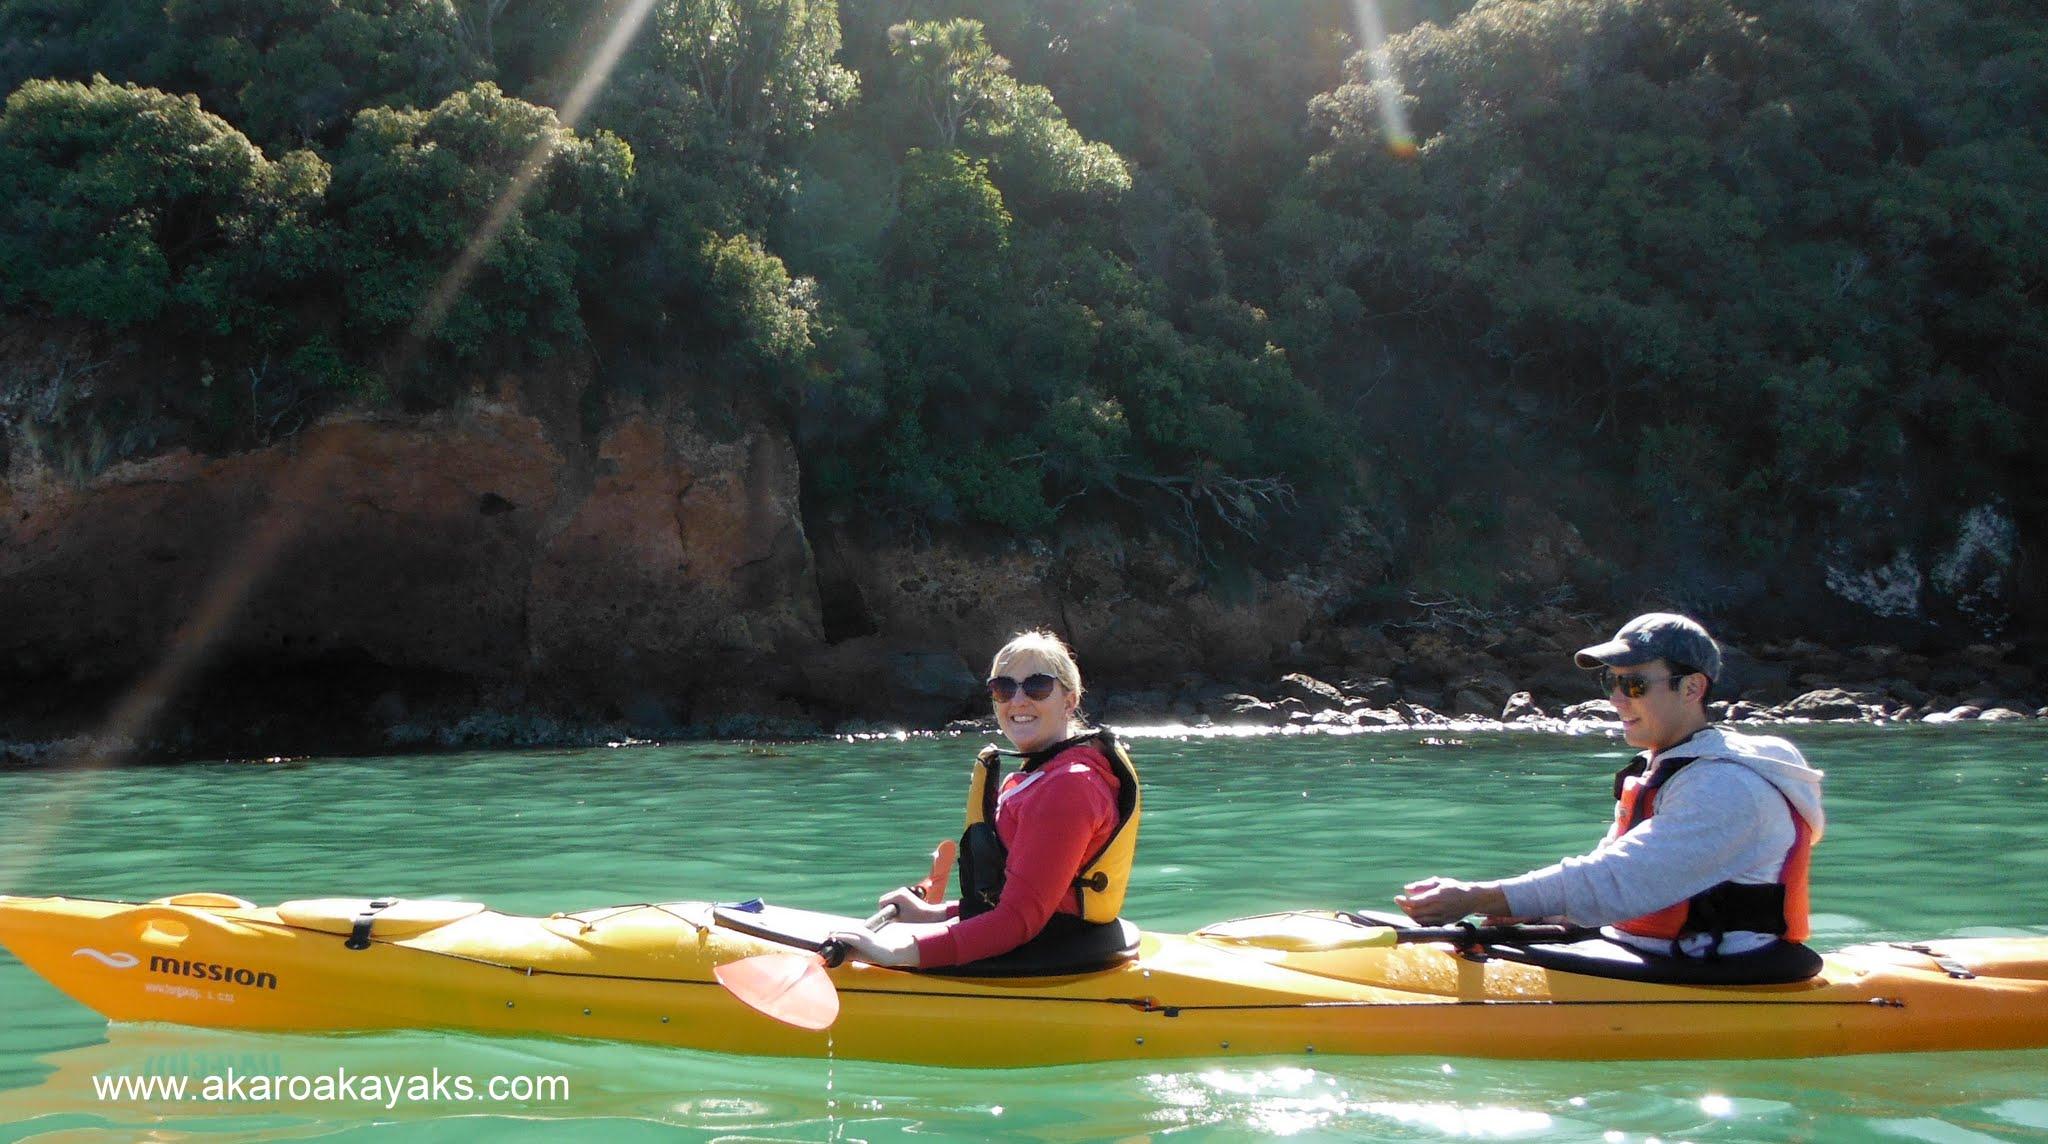 New Zealand Me Kayaking in Akaroa